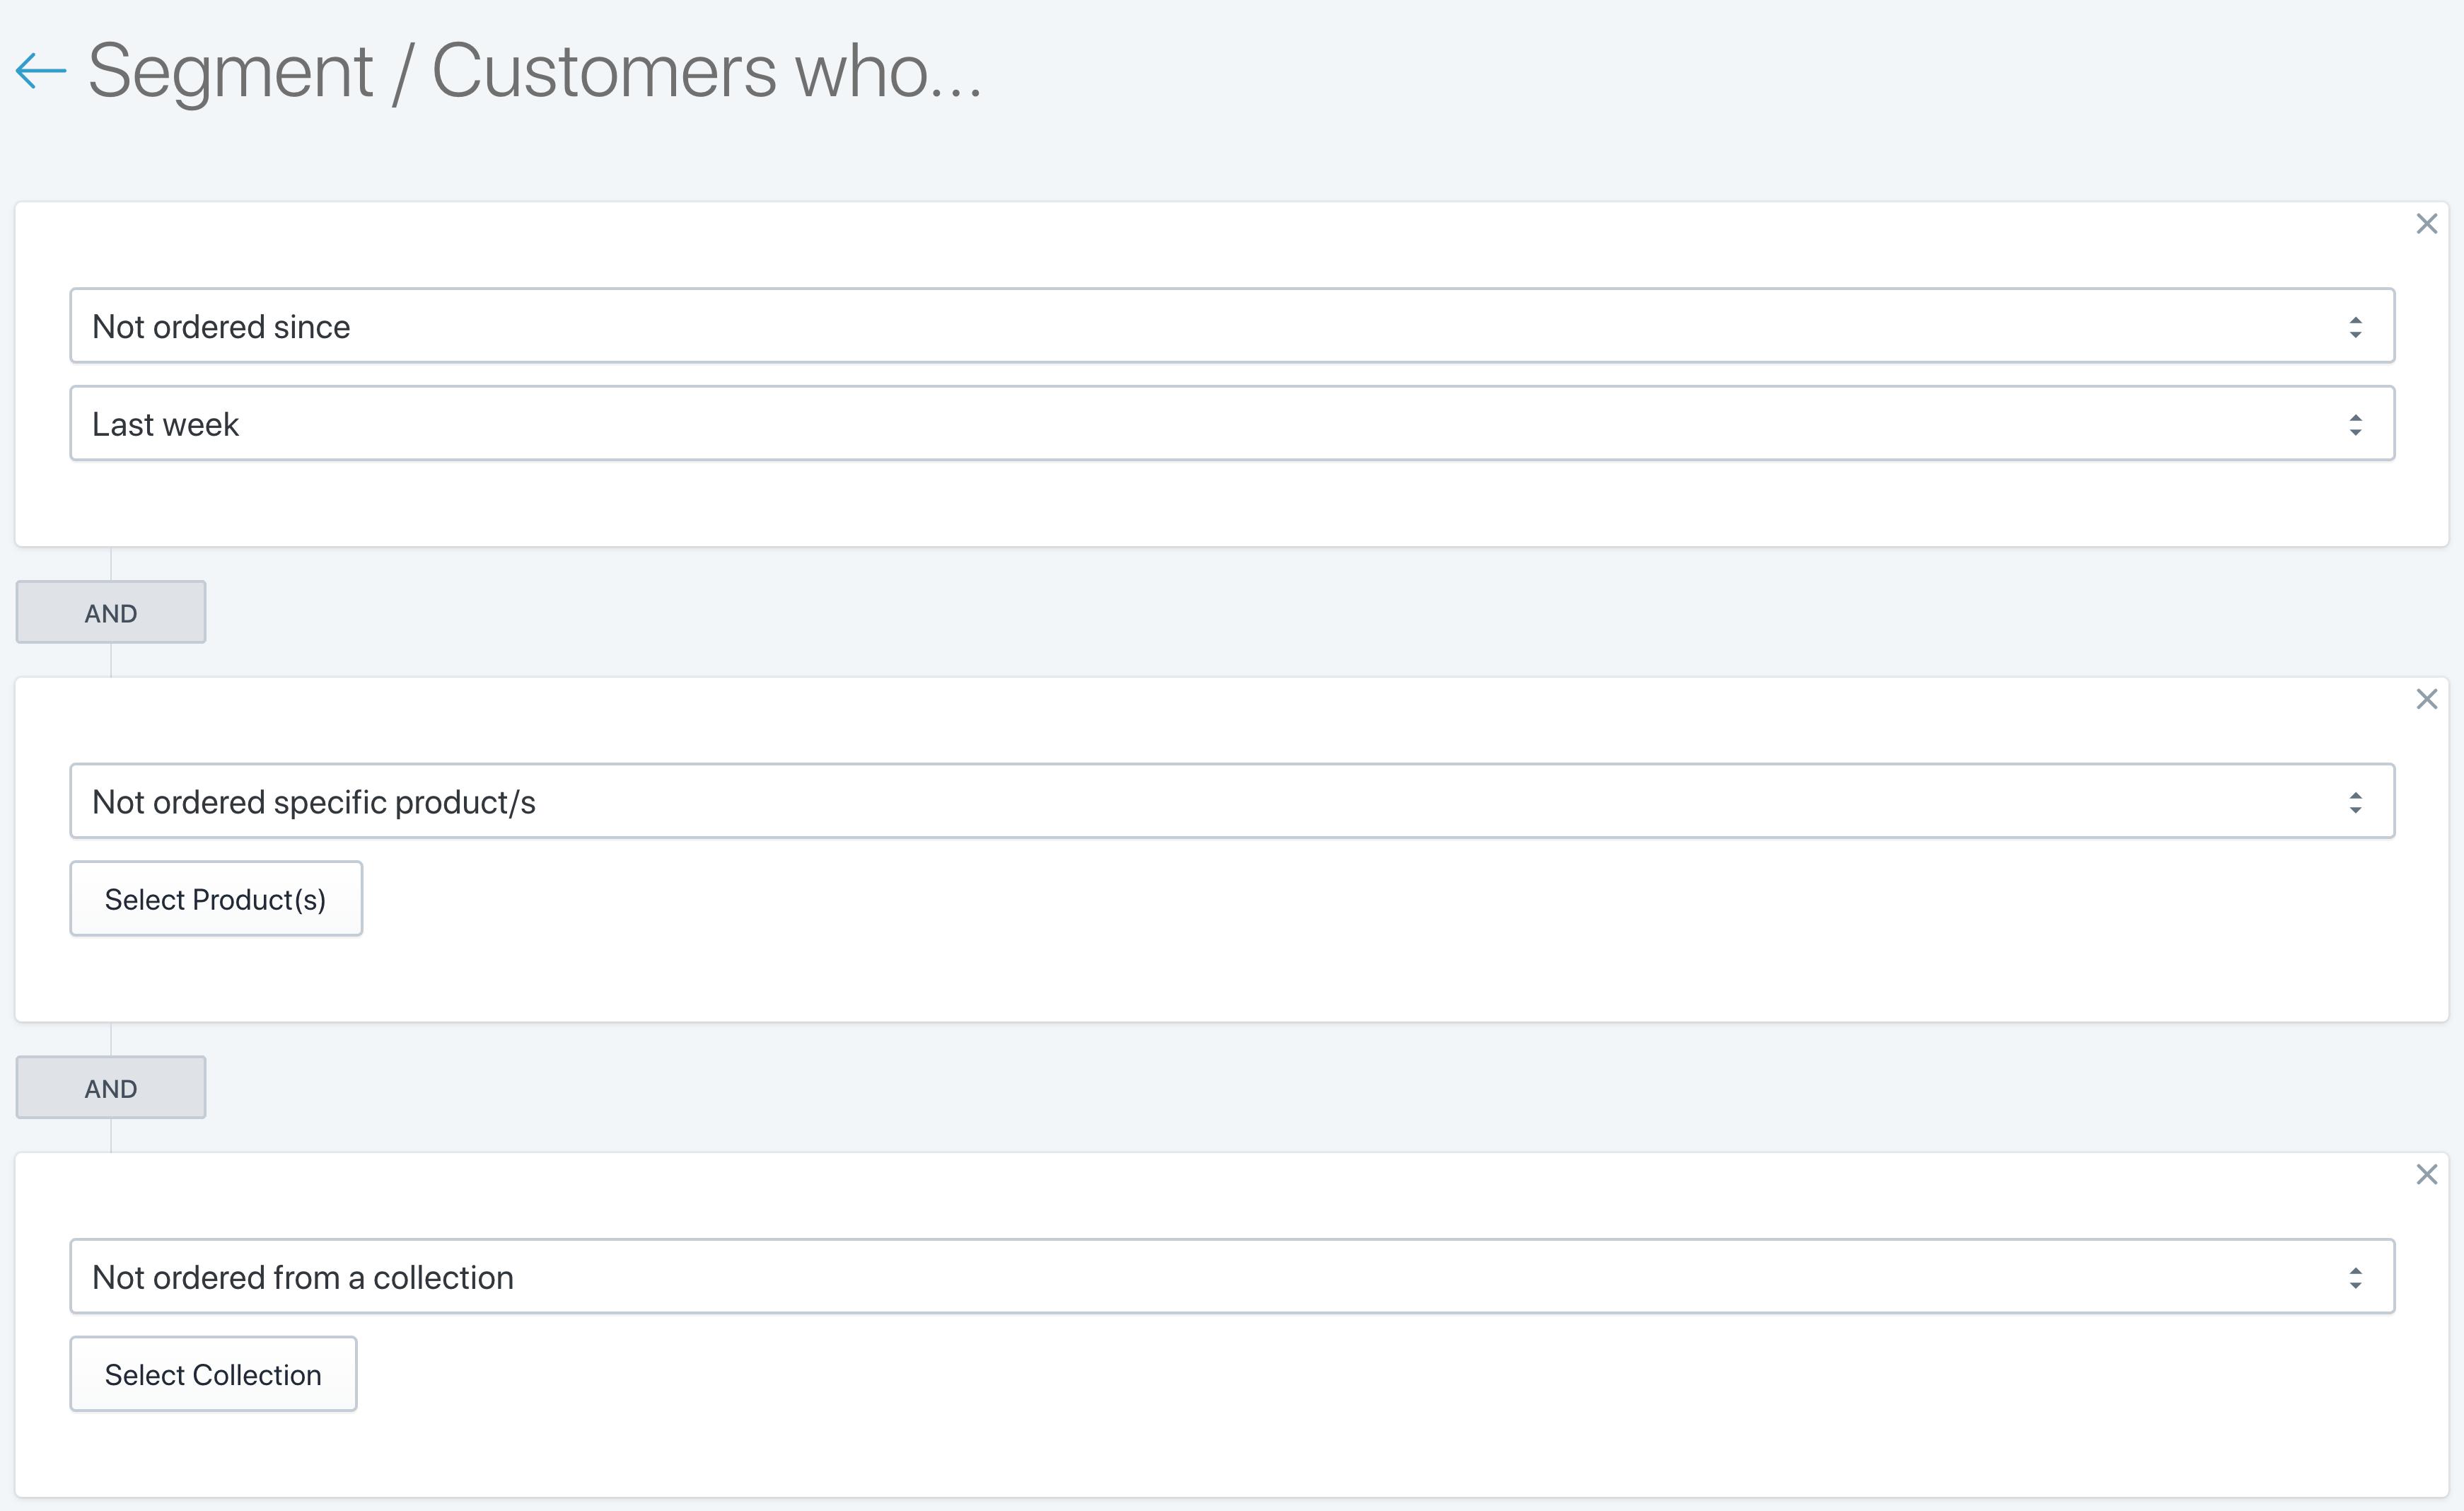 SMSBump Customer Inactivity Segments